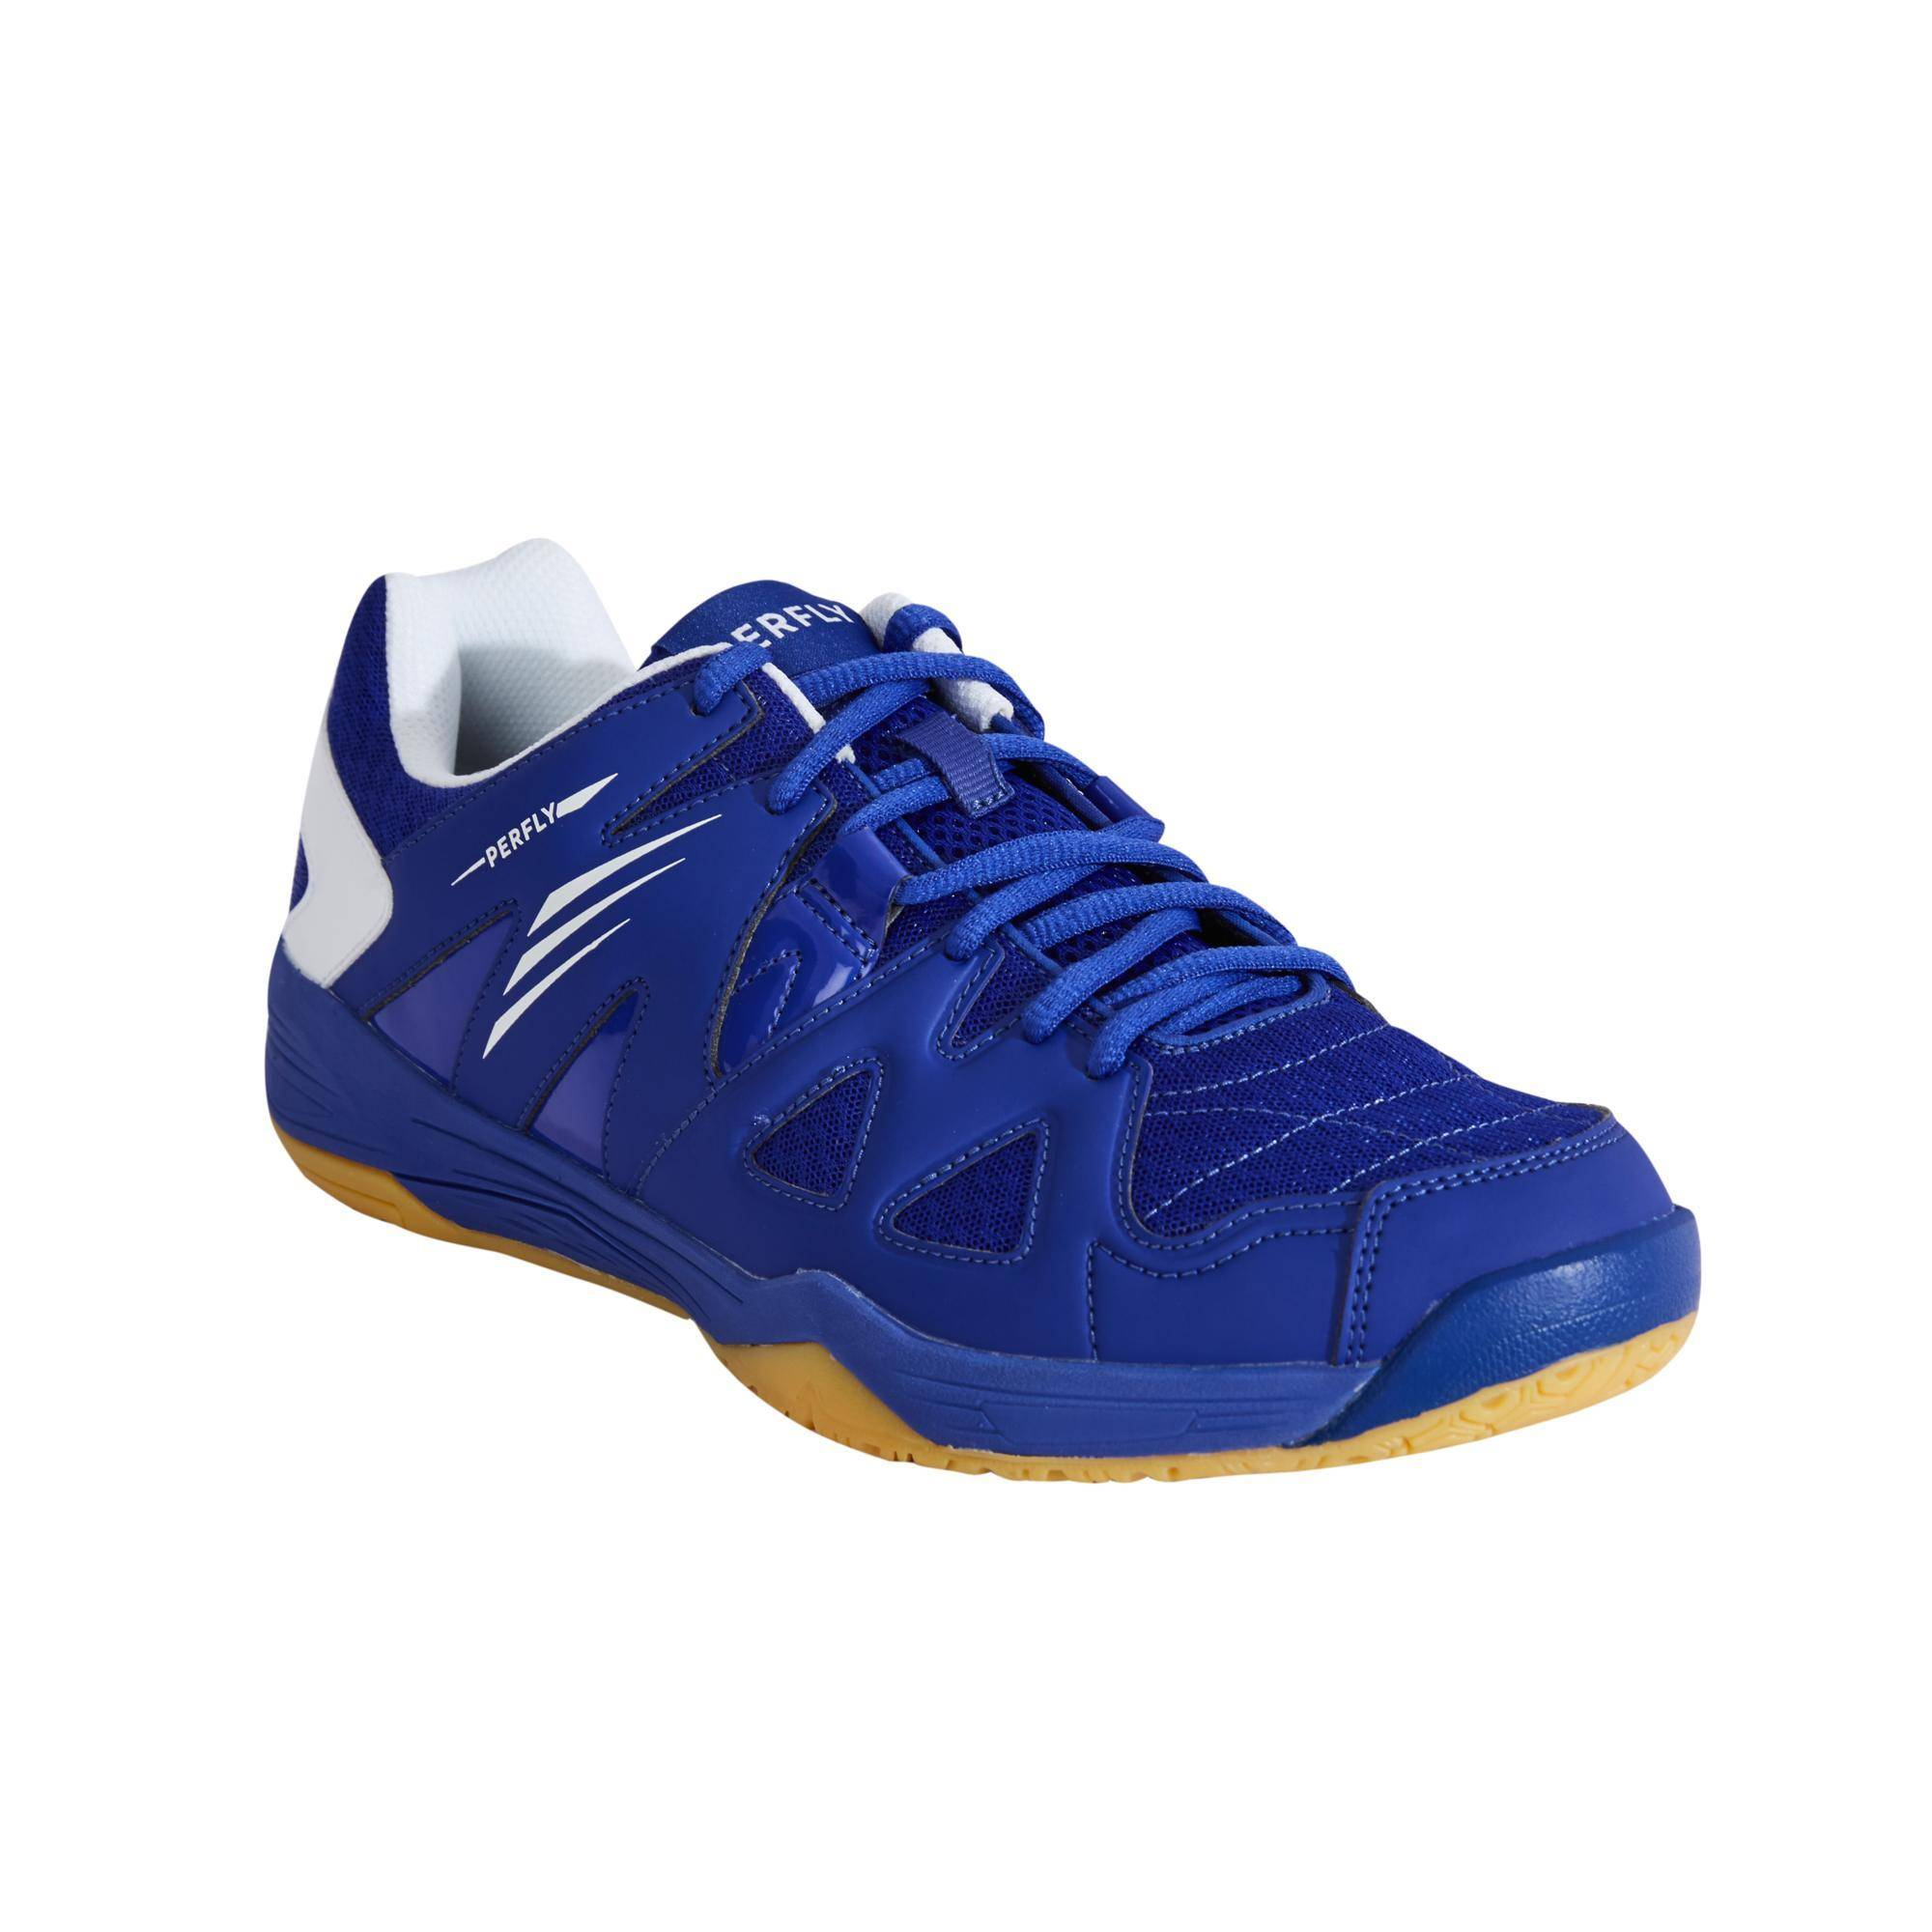 PERFLY Chaussures De Badminton pour Homme BS530 - Bleu - PERFLY - 43